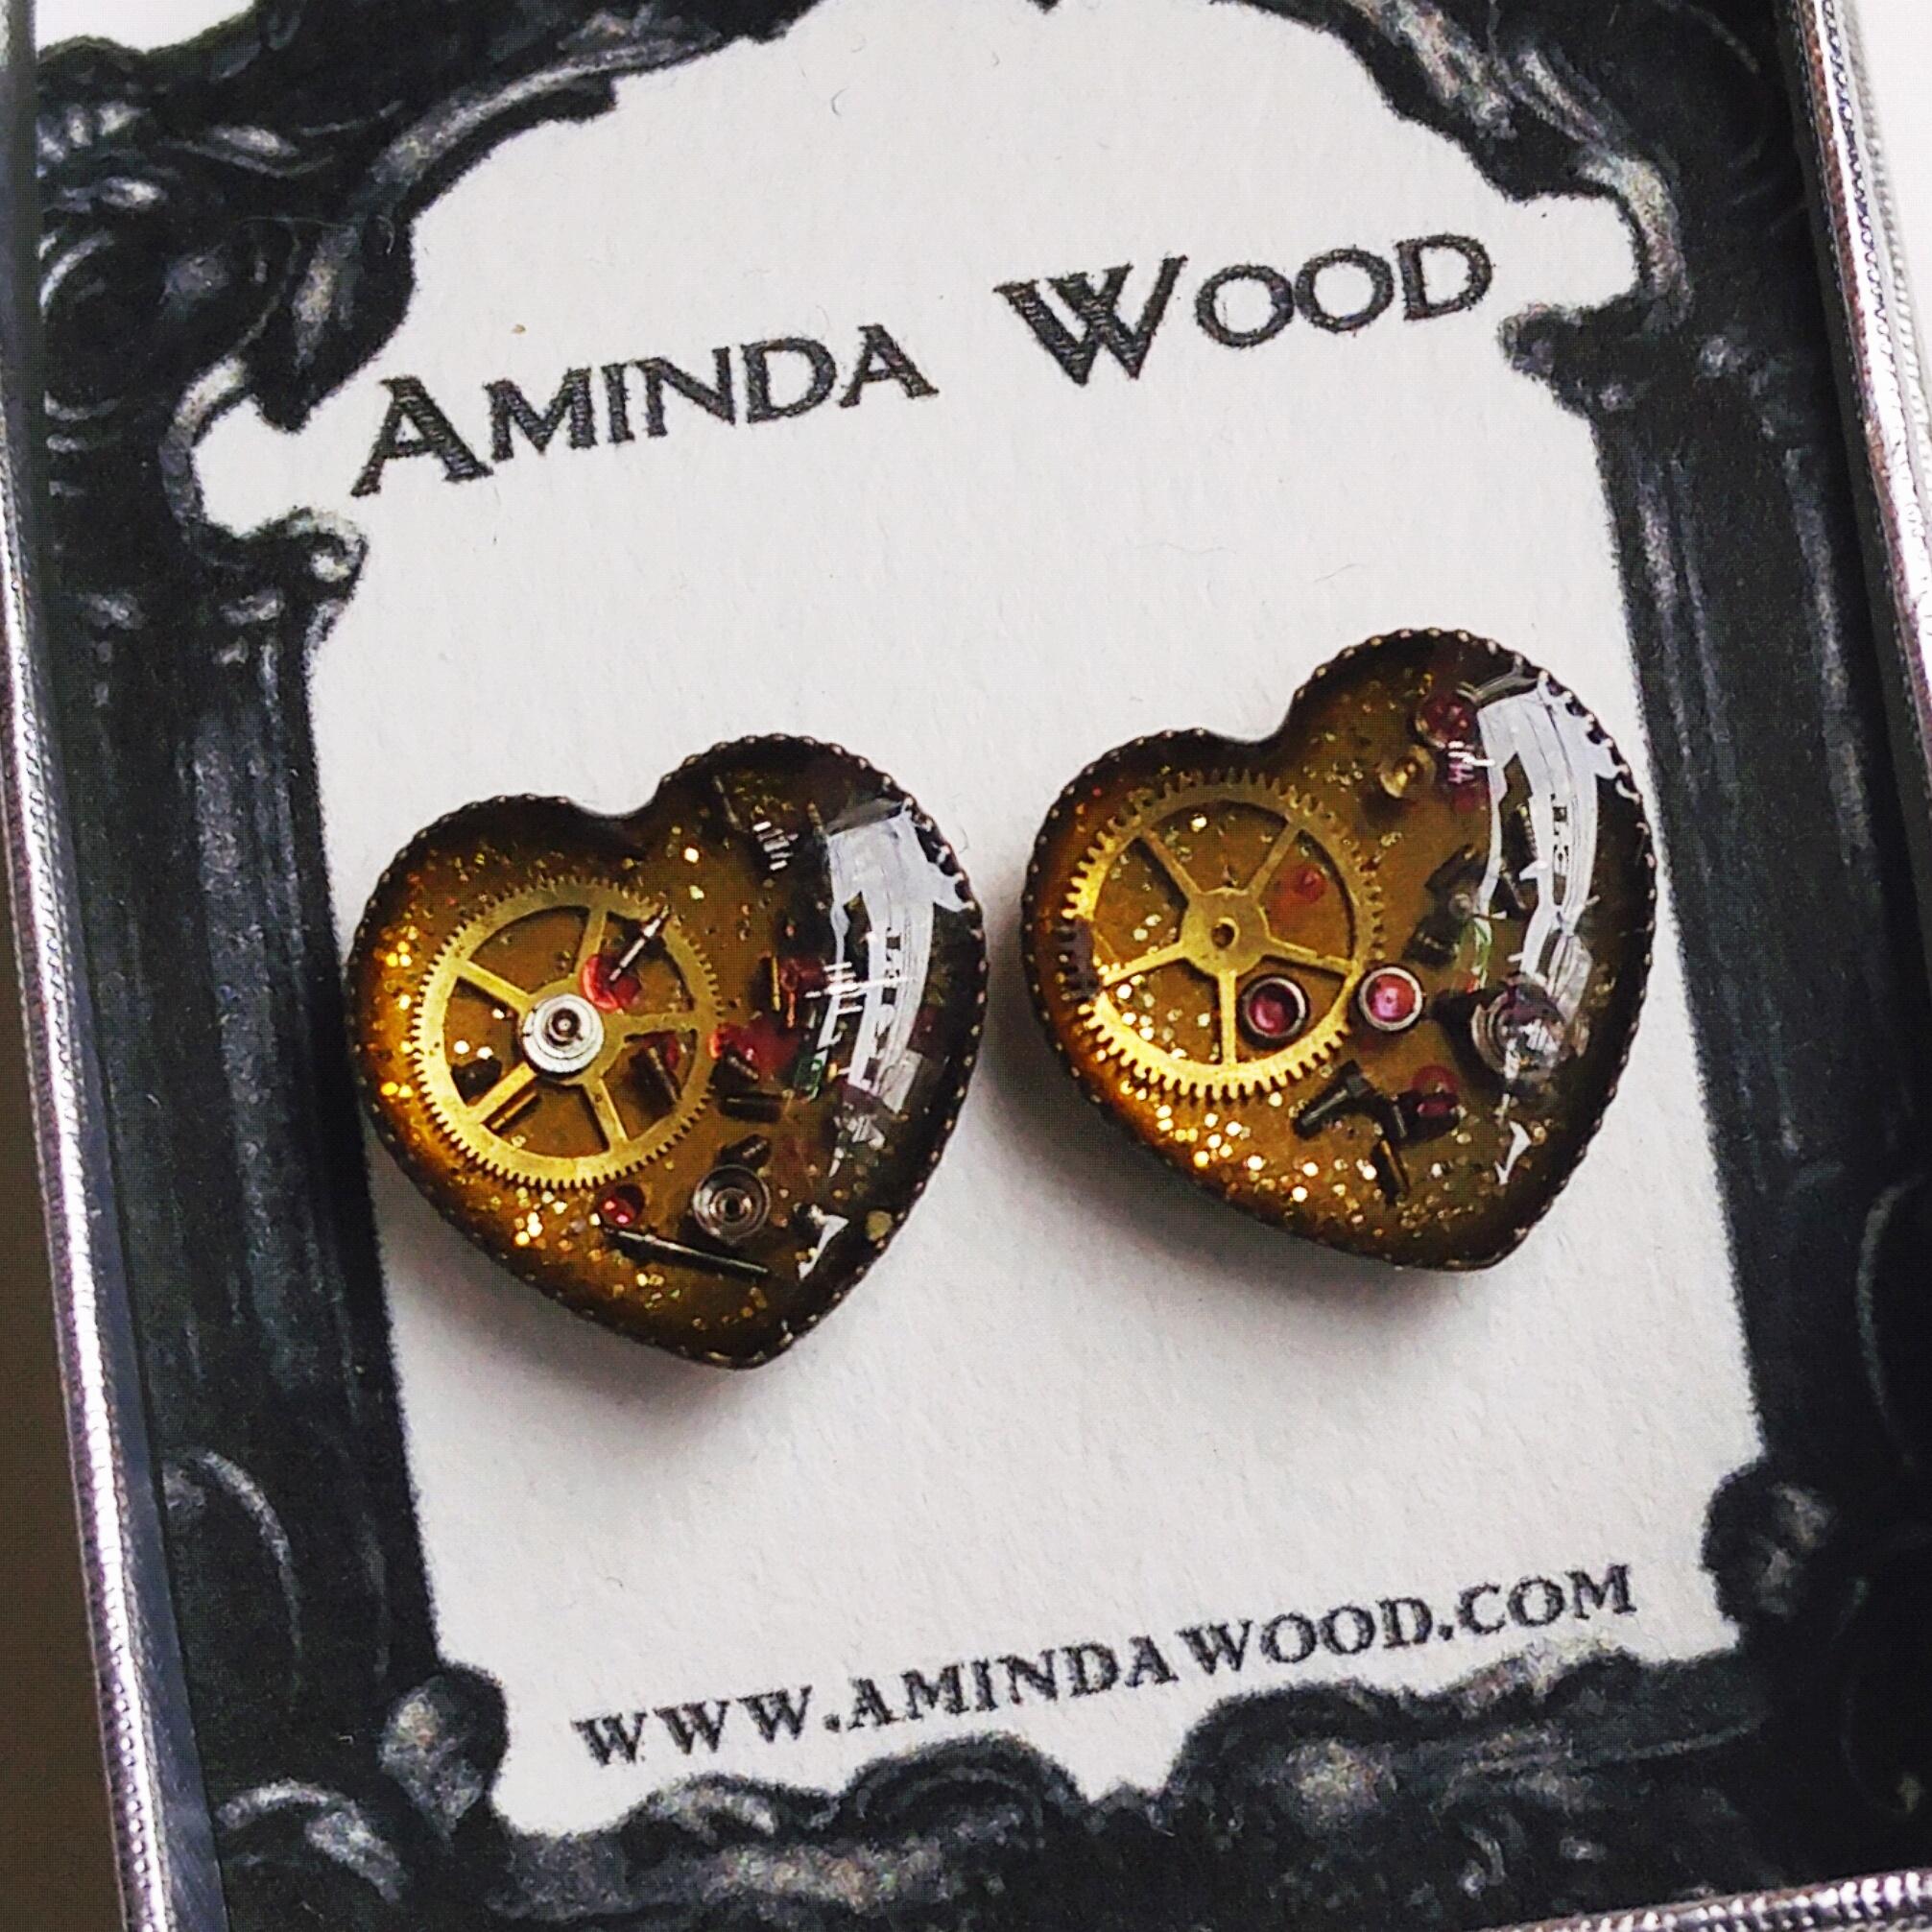 Aminda-Wood-Mechanical-Heart-Earrings.jpg